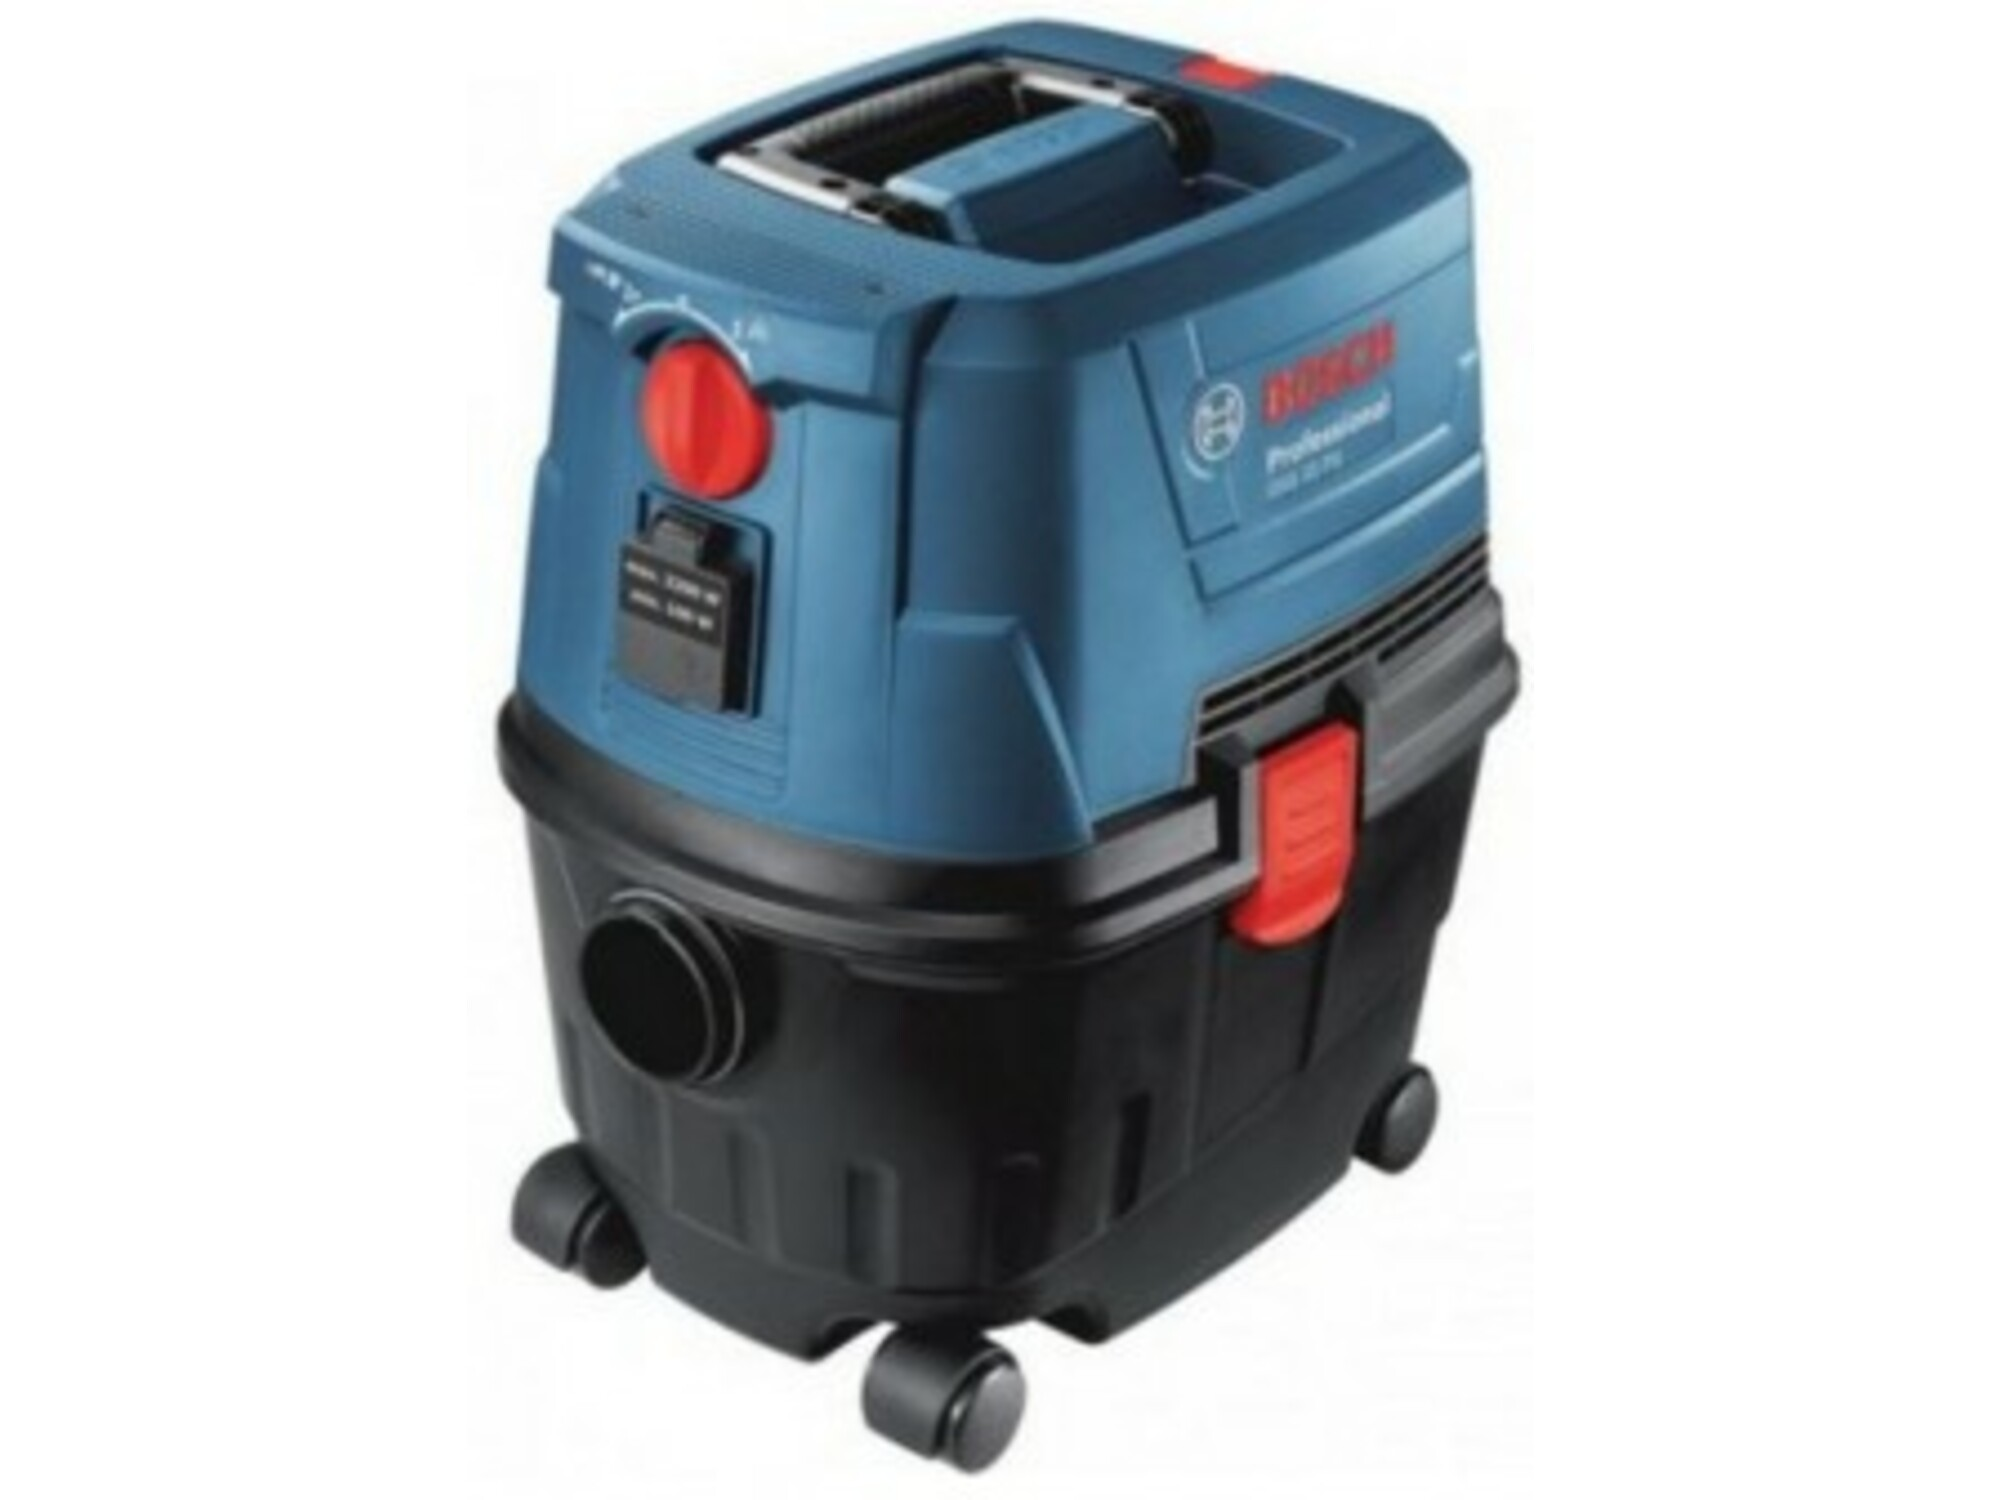 BOSCH PROFESSIONAL Mokri/suhi sesalnik GAS 15 PS 06019E5100